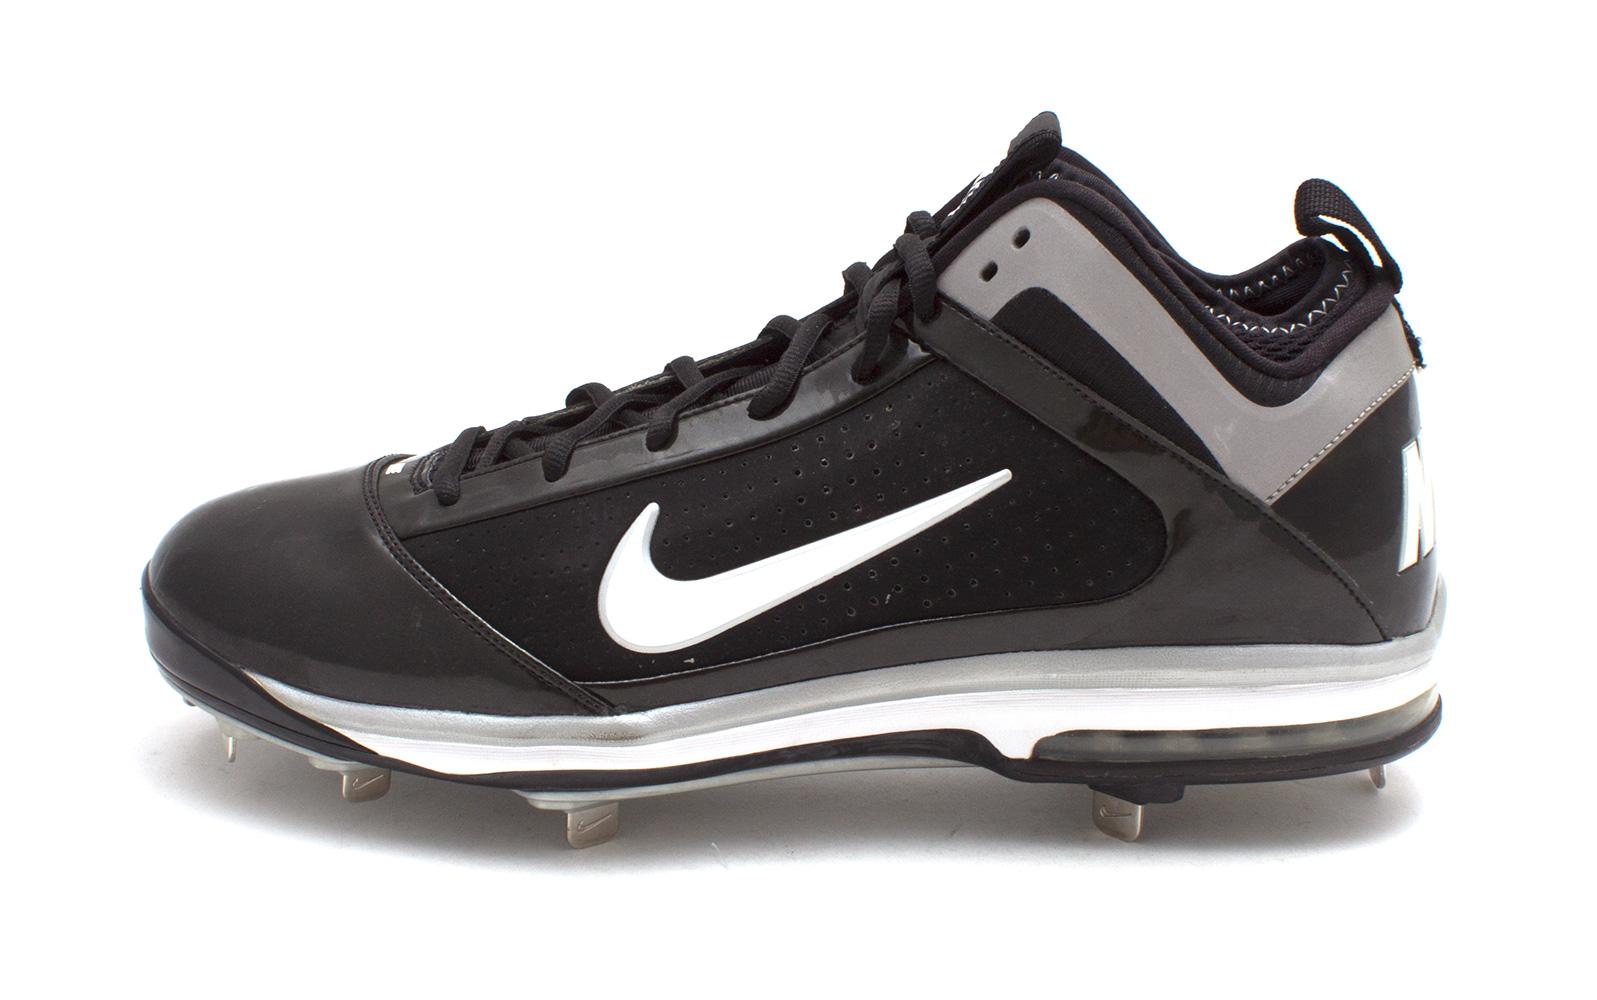 c6c342c46a Nike Mens Air Max Diamond Elite Metal 15 Hight Top Lace Up Baseball Shoes